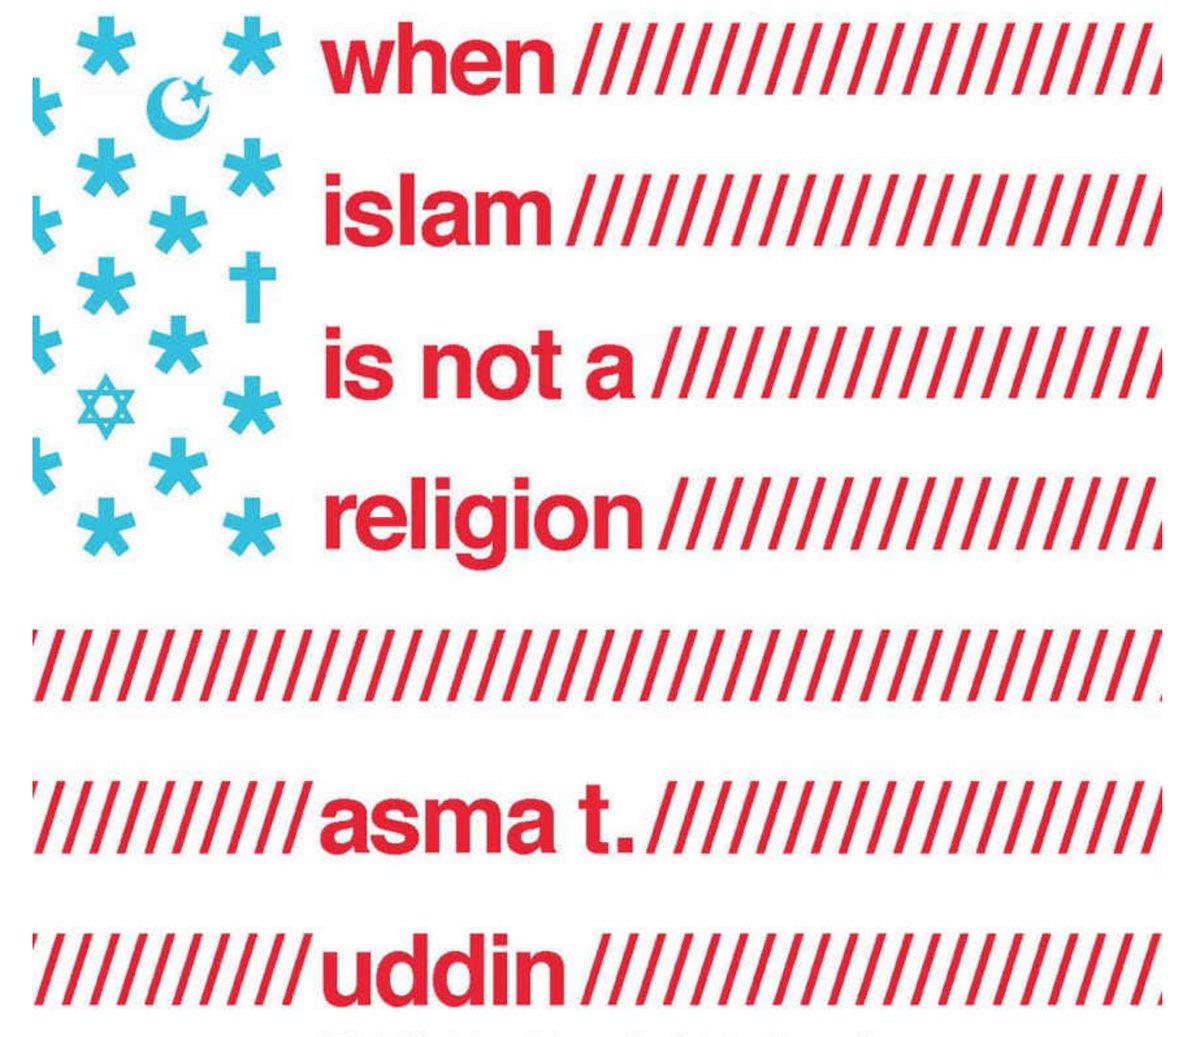 Asma Uddin At Asmauddinesq Twitter